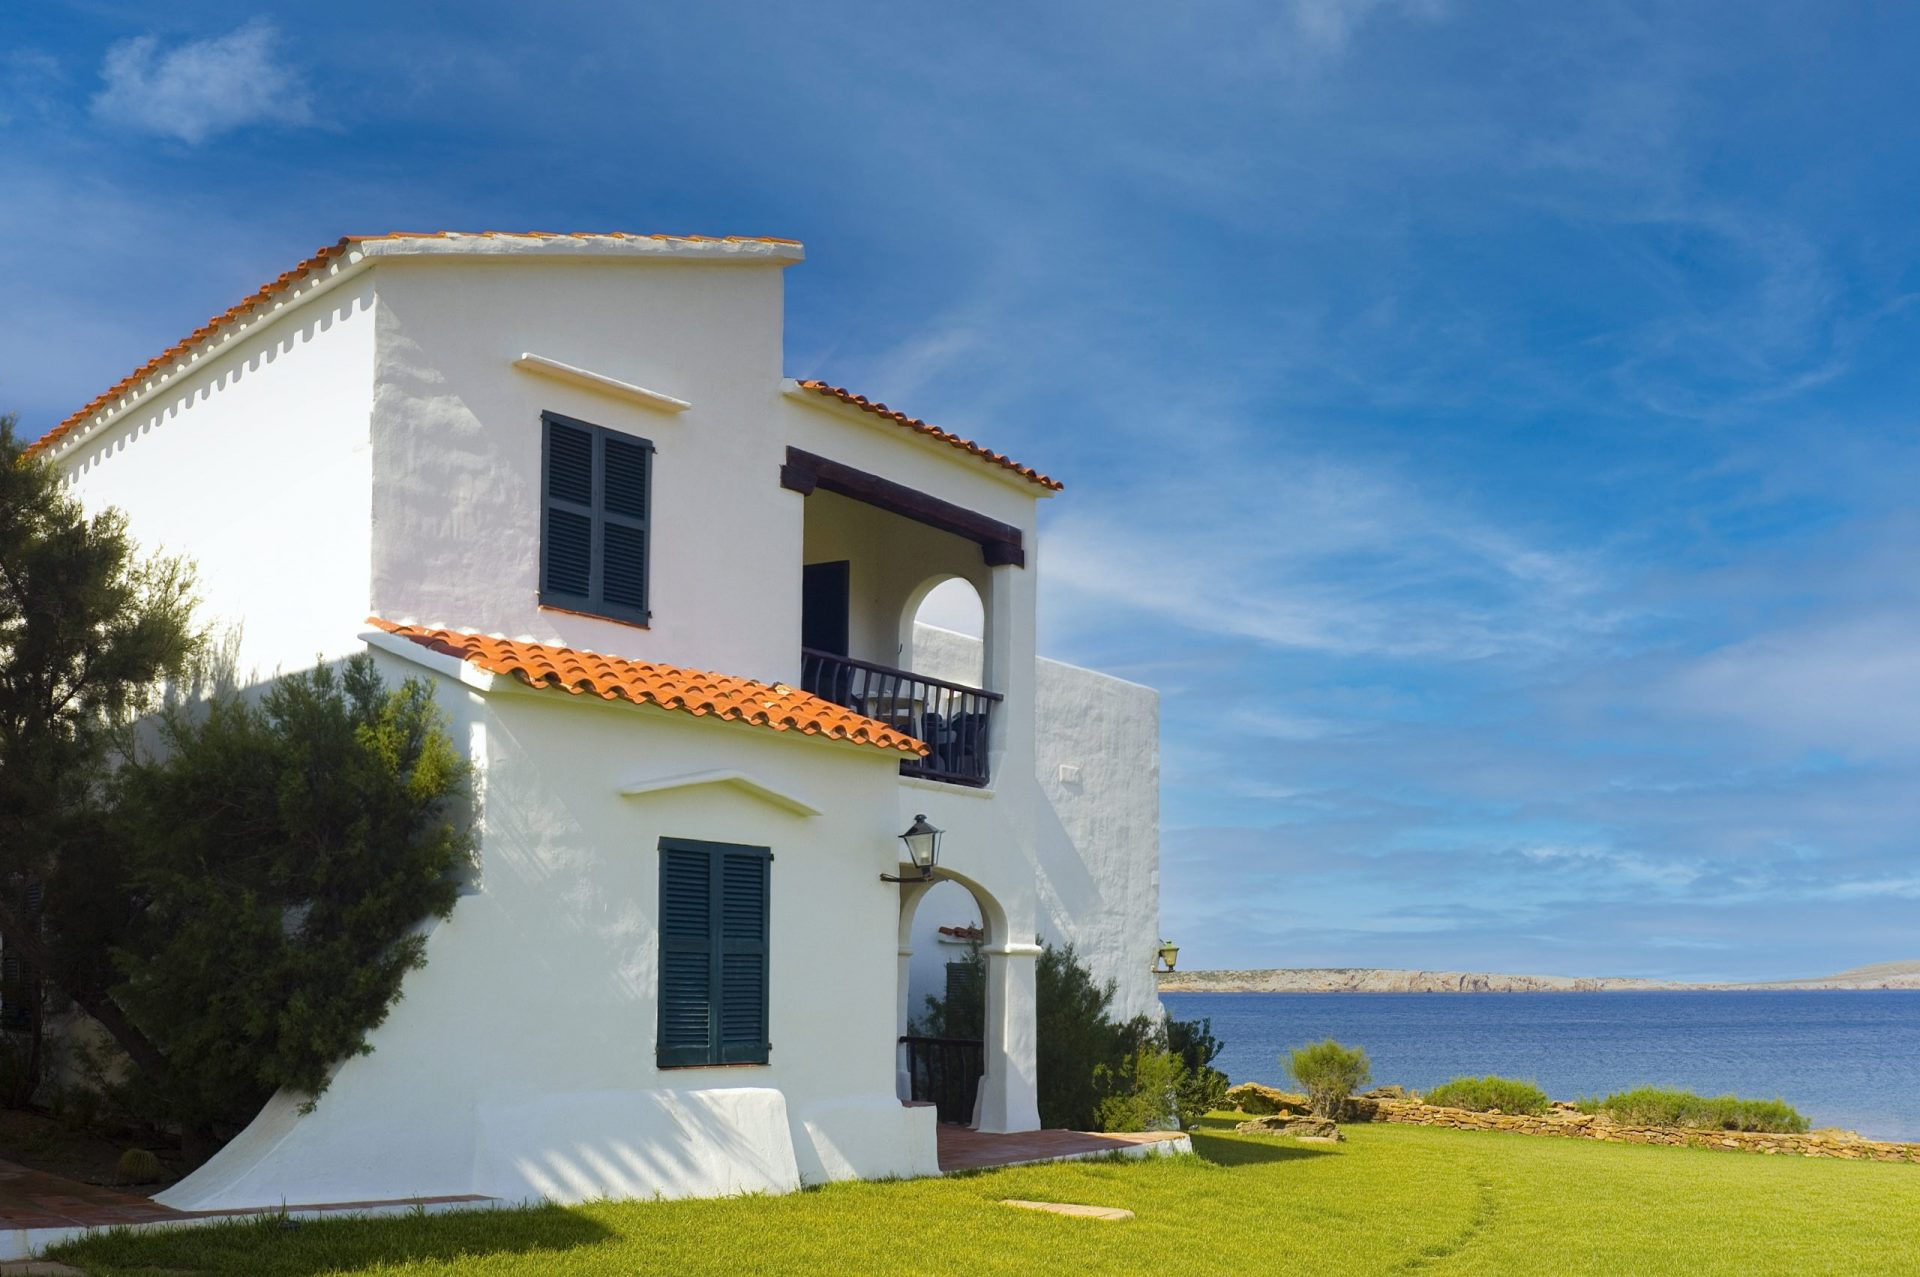 Majorca Holiday villas on a hot summers day.